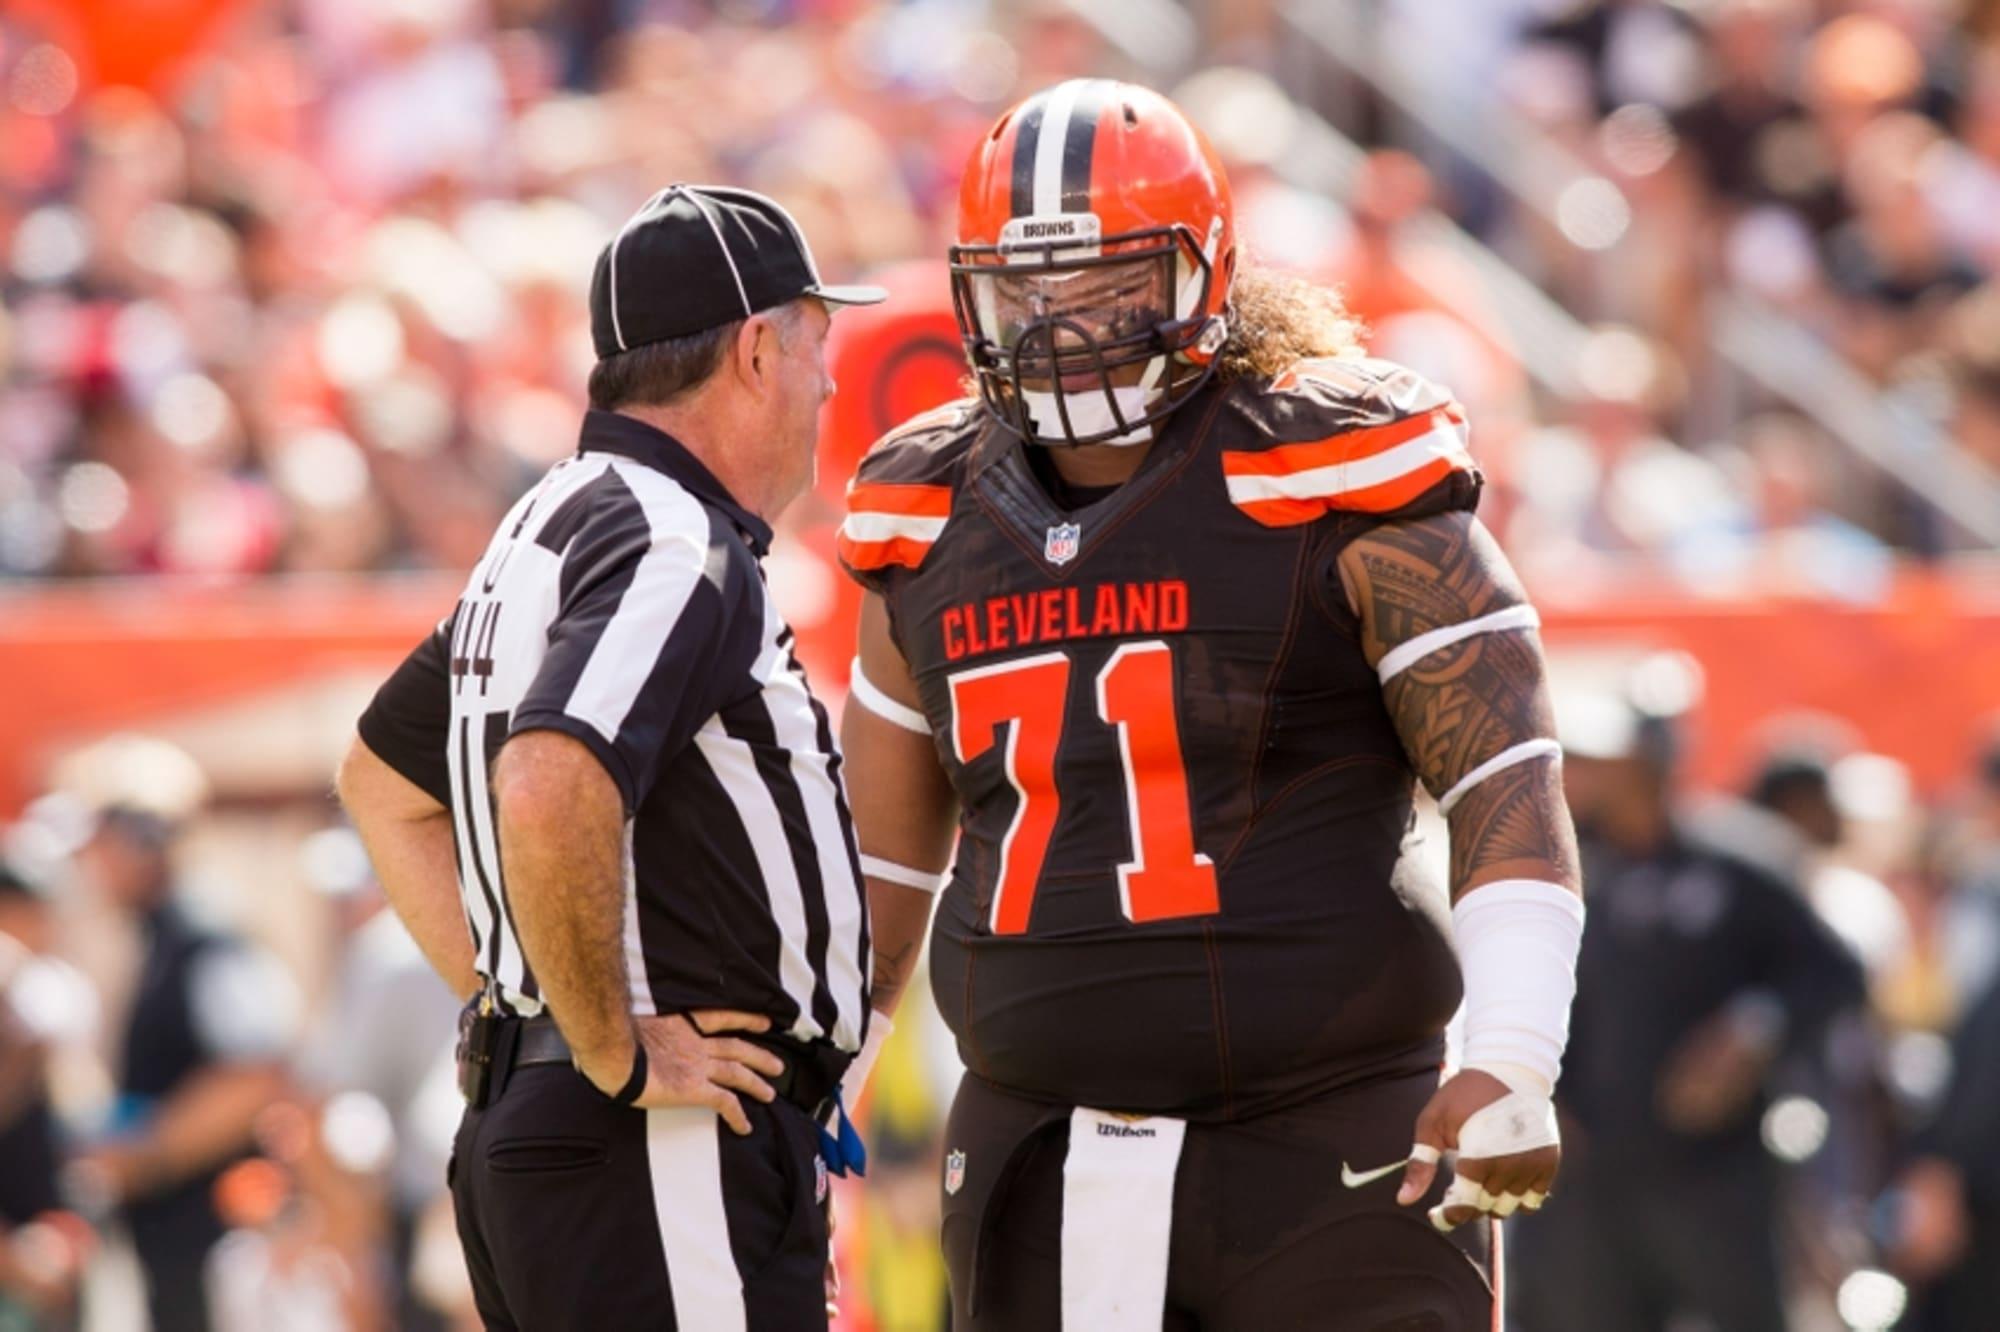 Cleveland Browns: A slimmer Danny Shelton better in 2016?